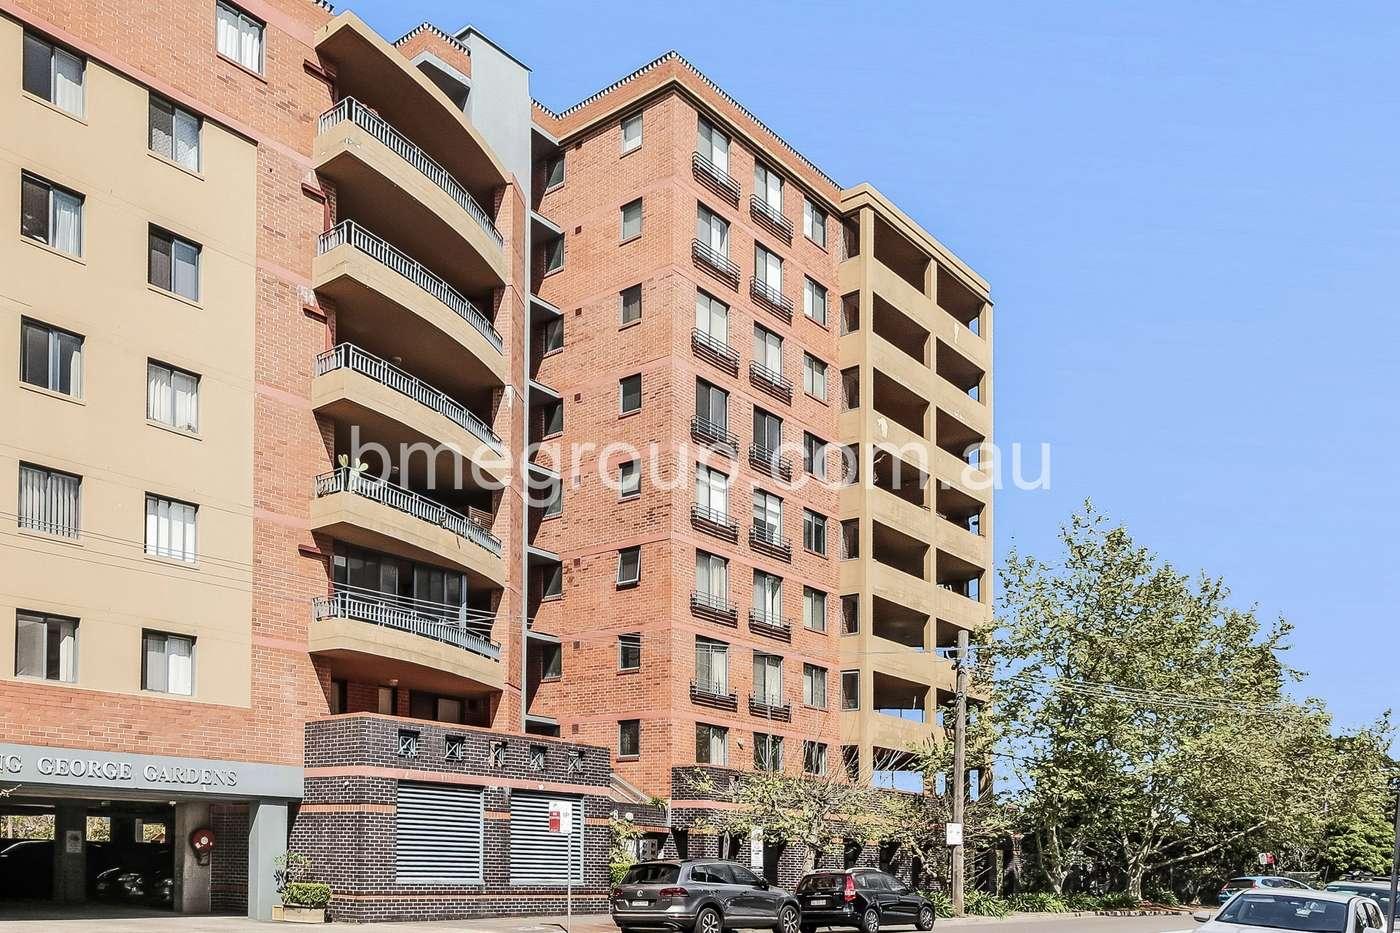 Main view of Homely apartment listing, Unit 41/2-8 Bridge St, Hurstville, NSW 2220